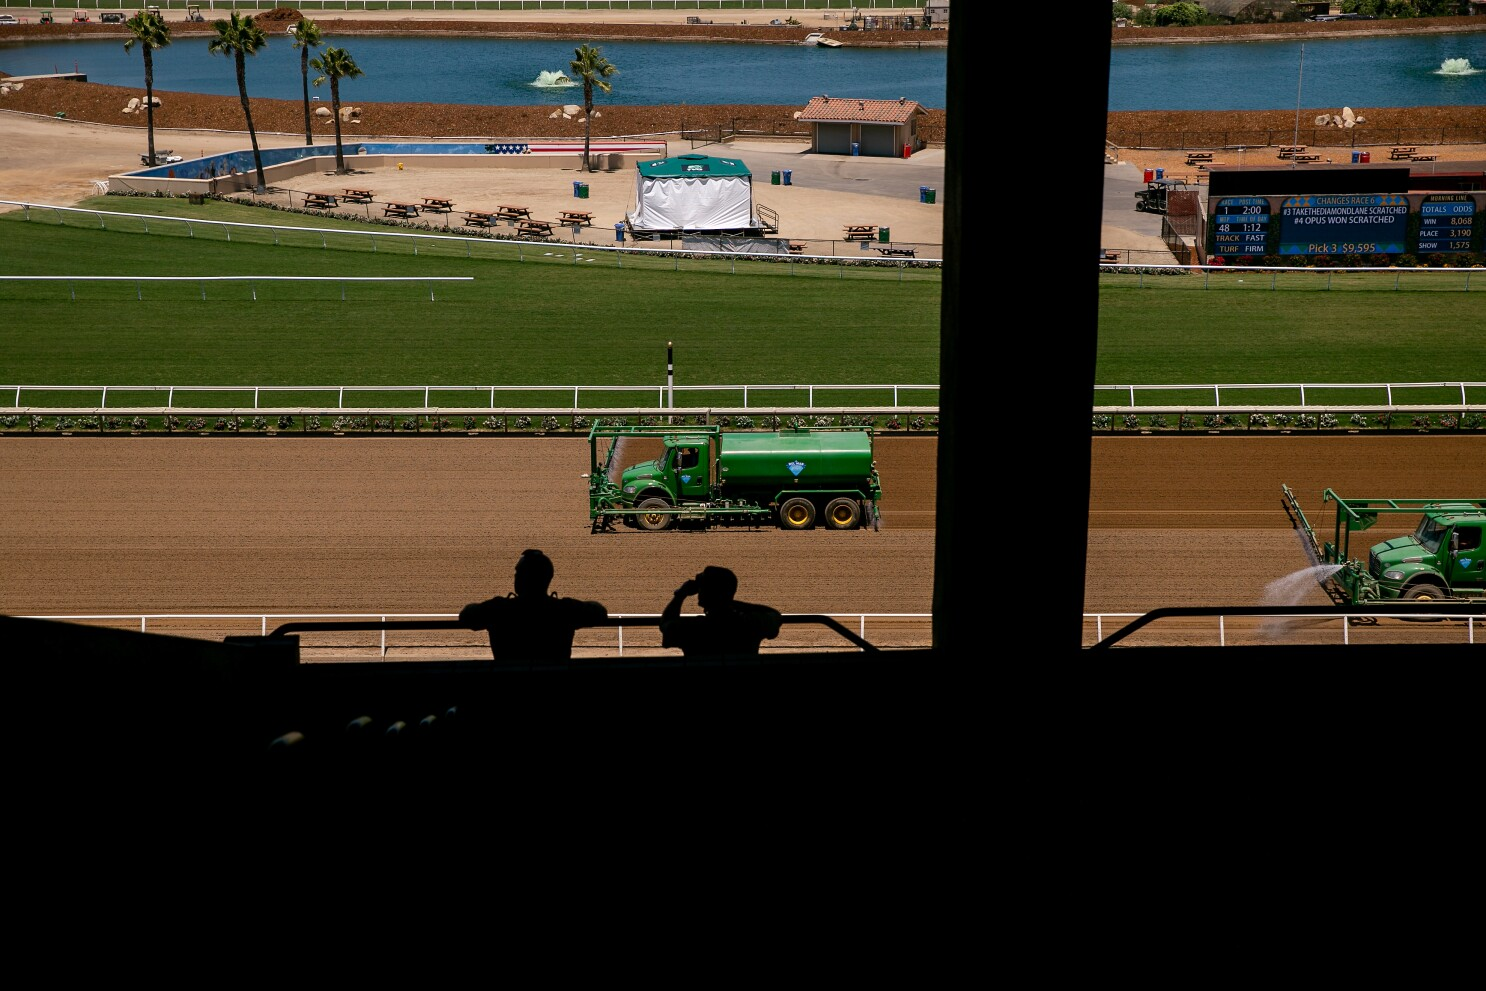 Third horse dies in training at Del Mar